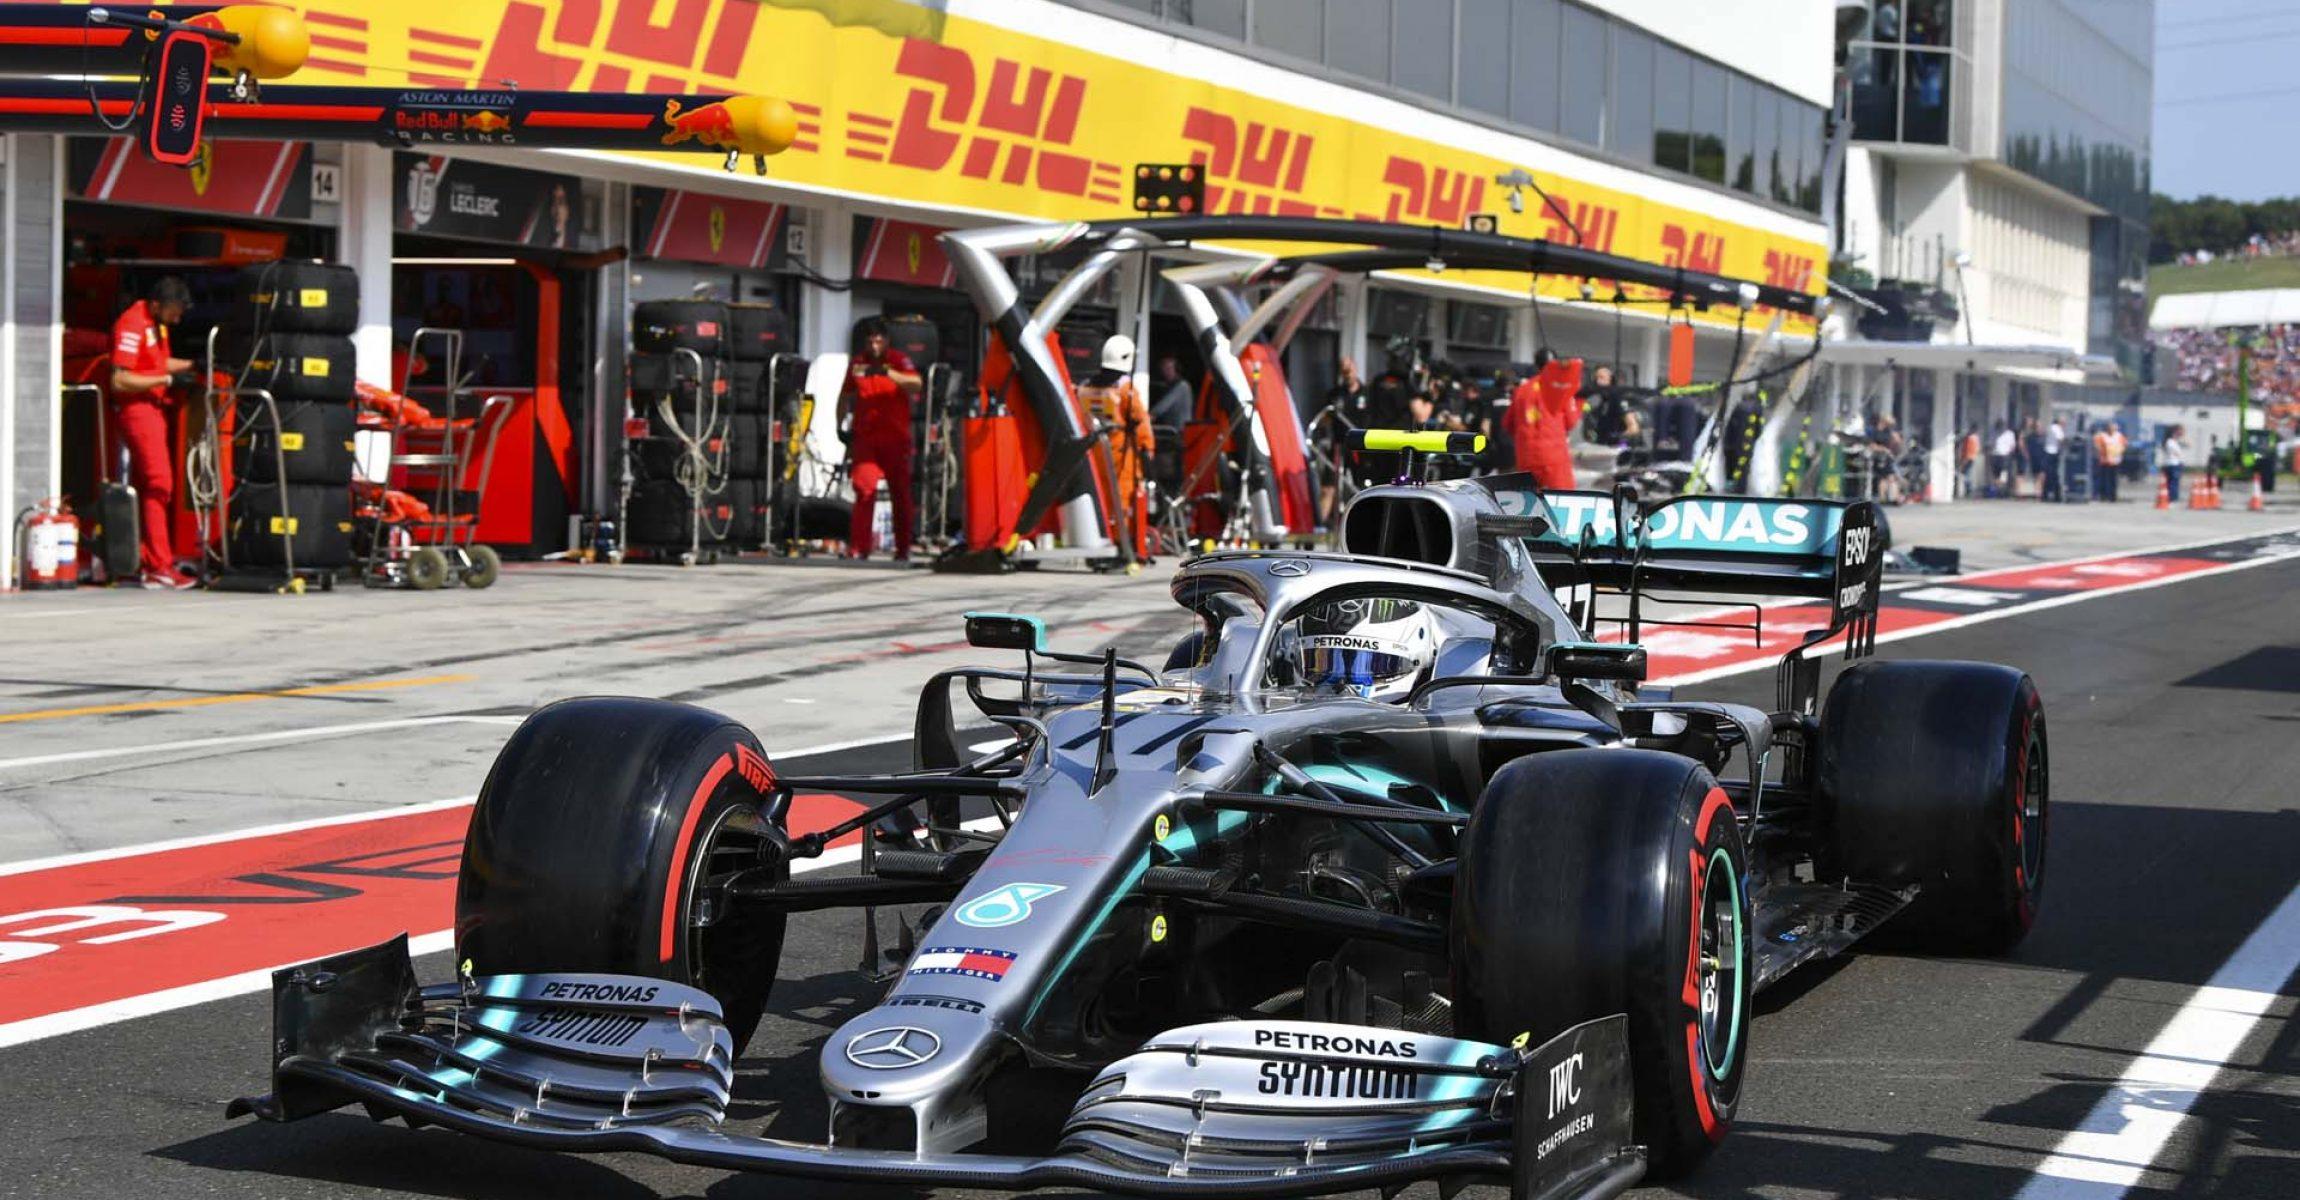 2019 Hungarian Grand Prix, Saturday - LAT Images Valtteri Bottas Mercedes